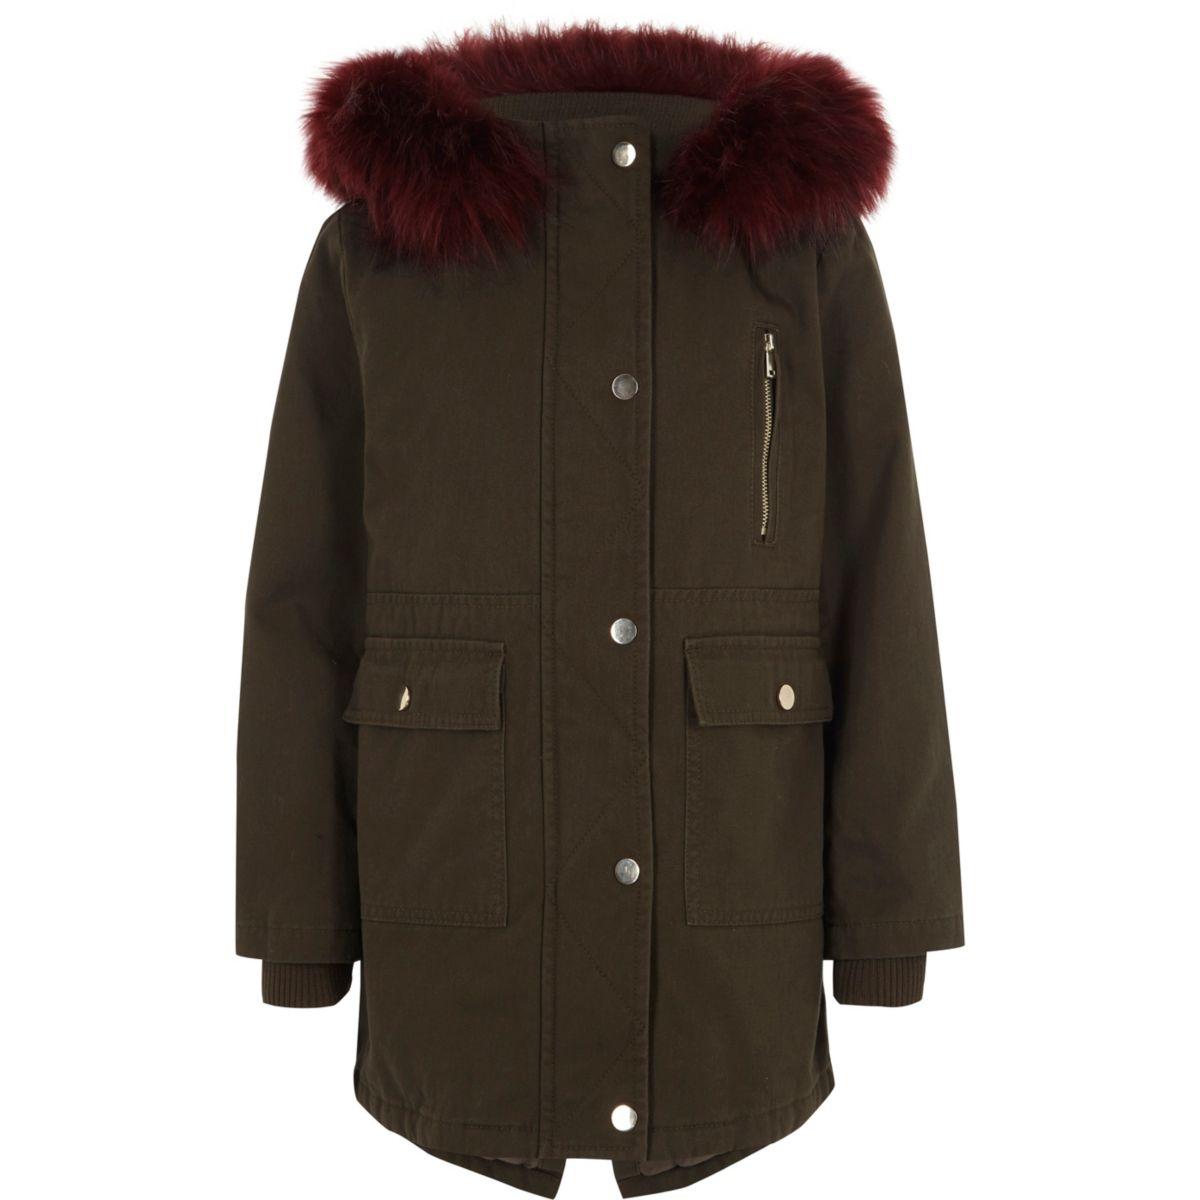 Girls khaki faux fur trim parka coat - Coats - Coats & Jackets - girls